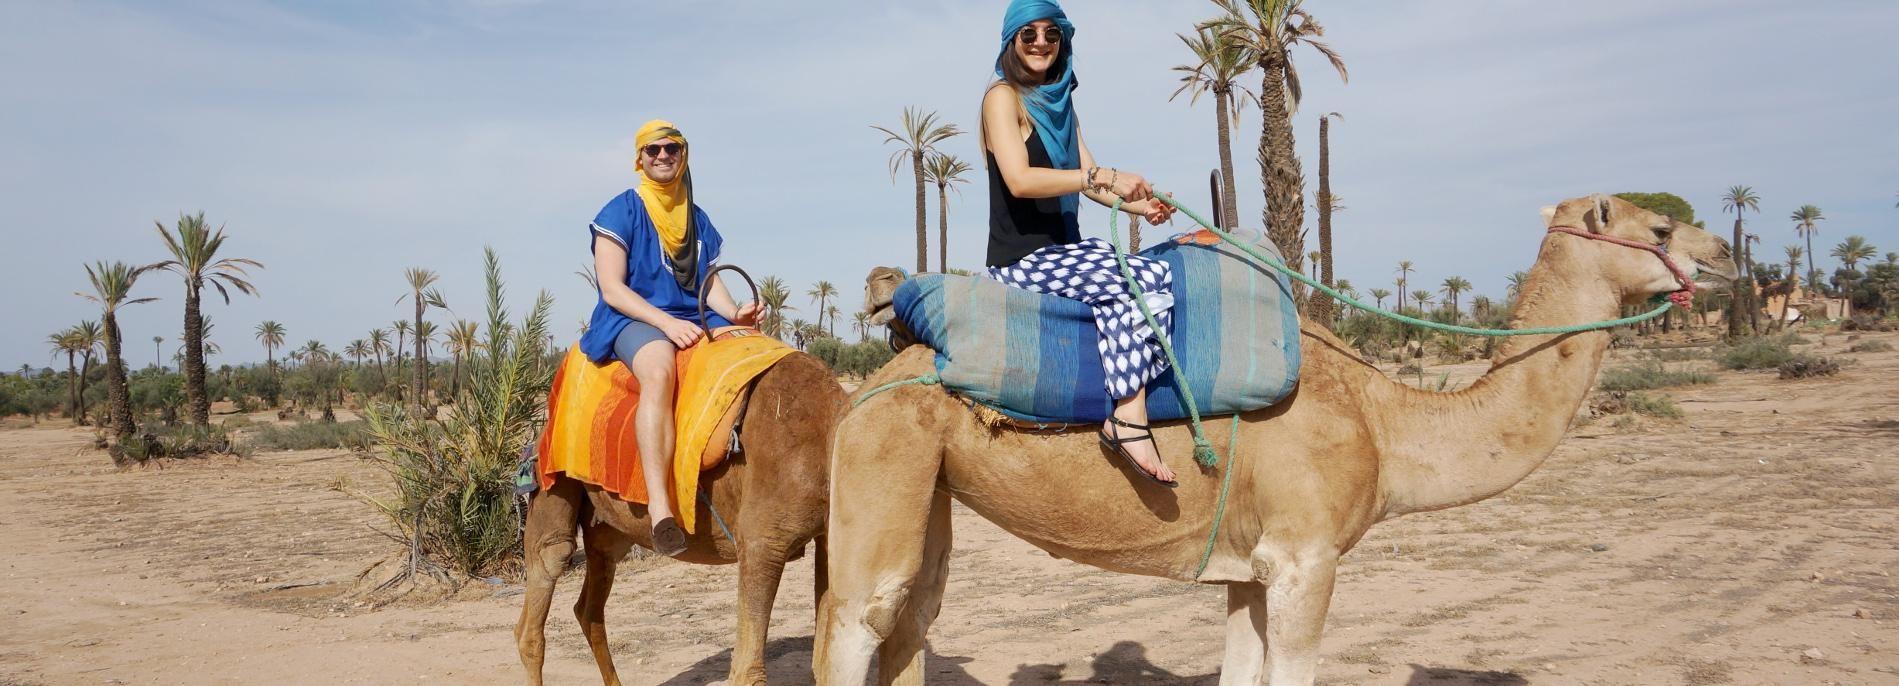 Marrakech: Camel Ride in Palm Groves with Tea Break